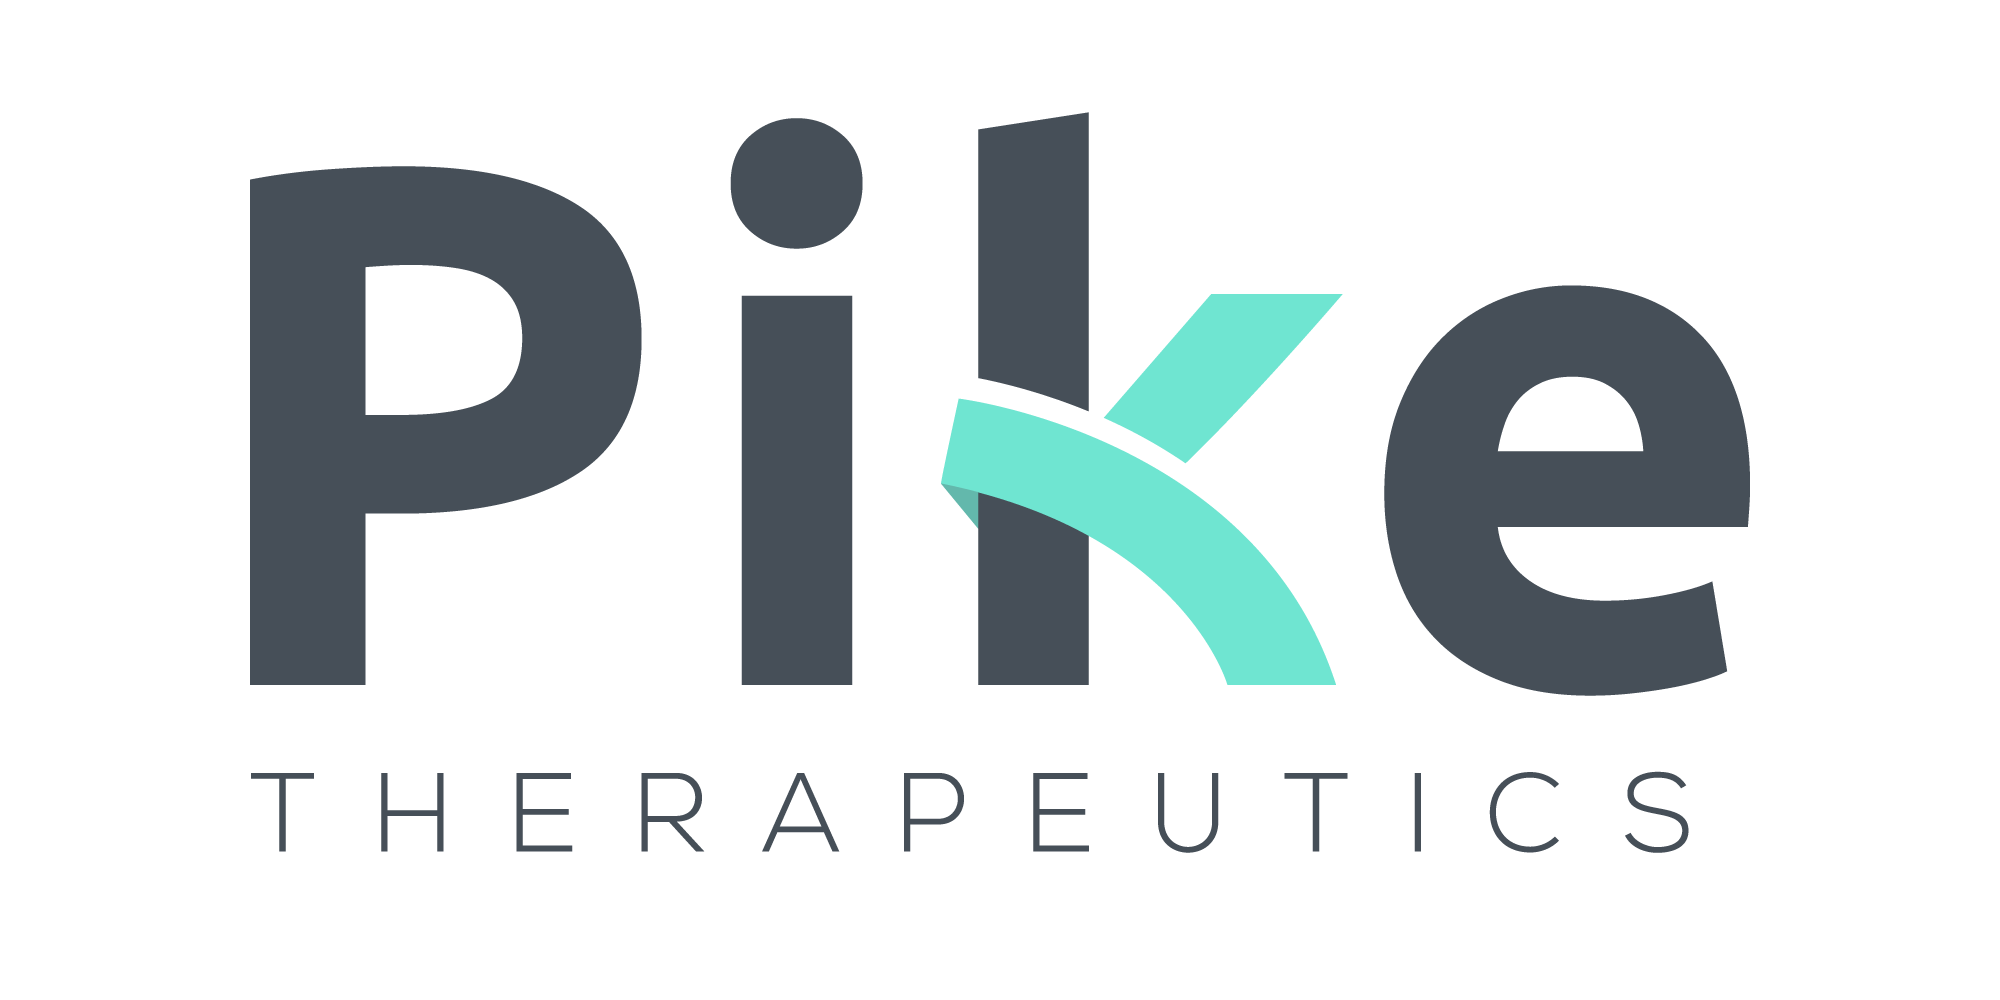 Global Biotechnology Company rebrand